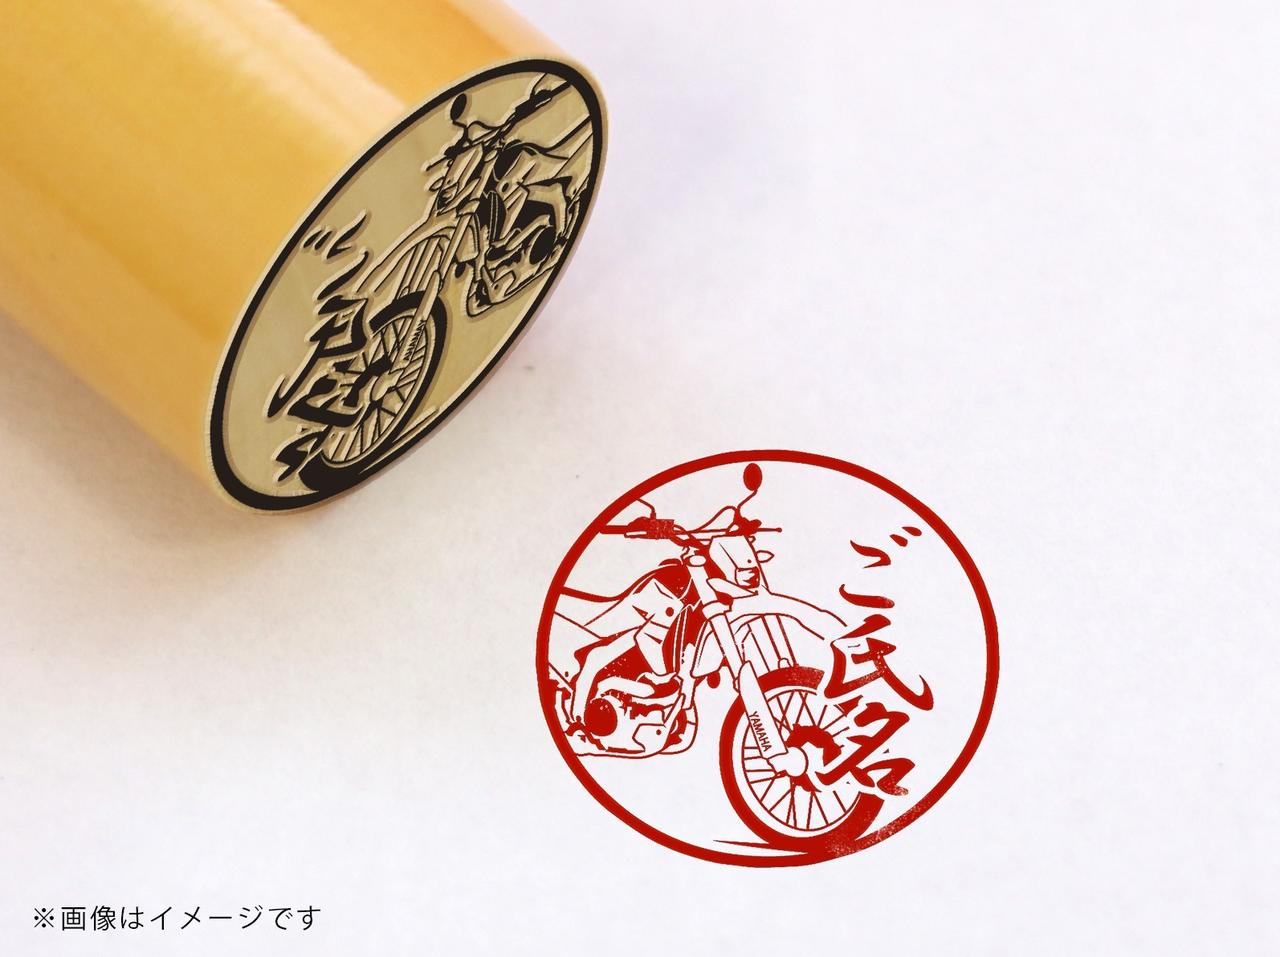 Images : 【YAMAHA】WR250R・柘植丸印18mm